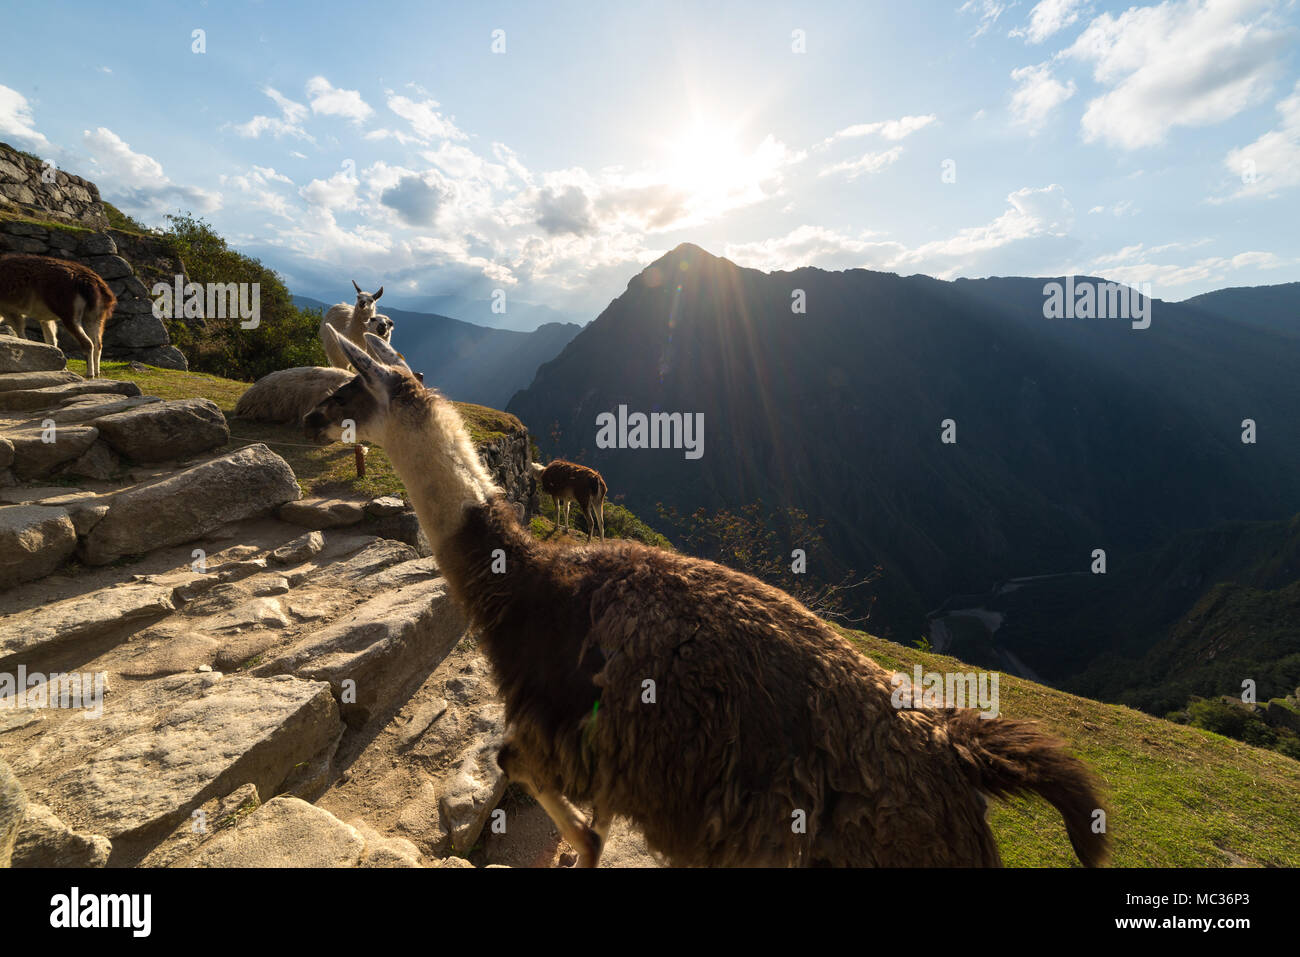 Llamas at Machu Picchu, Peru, top travel destination. - Stock Image